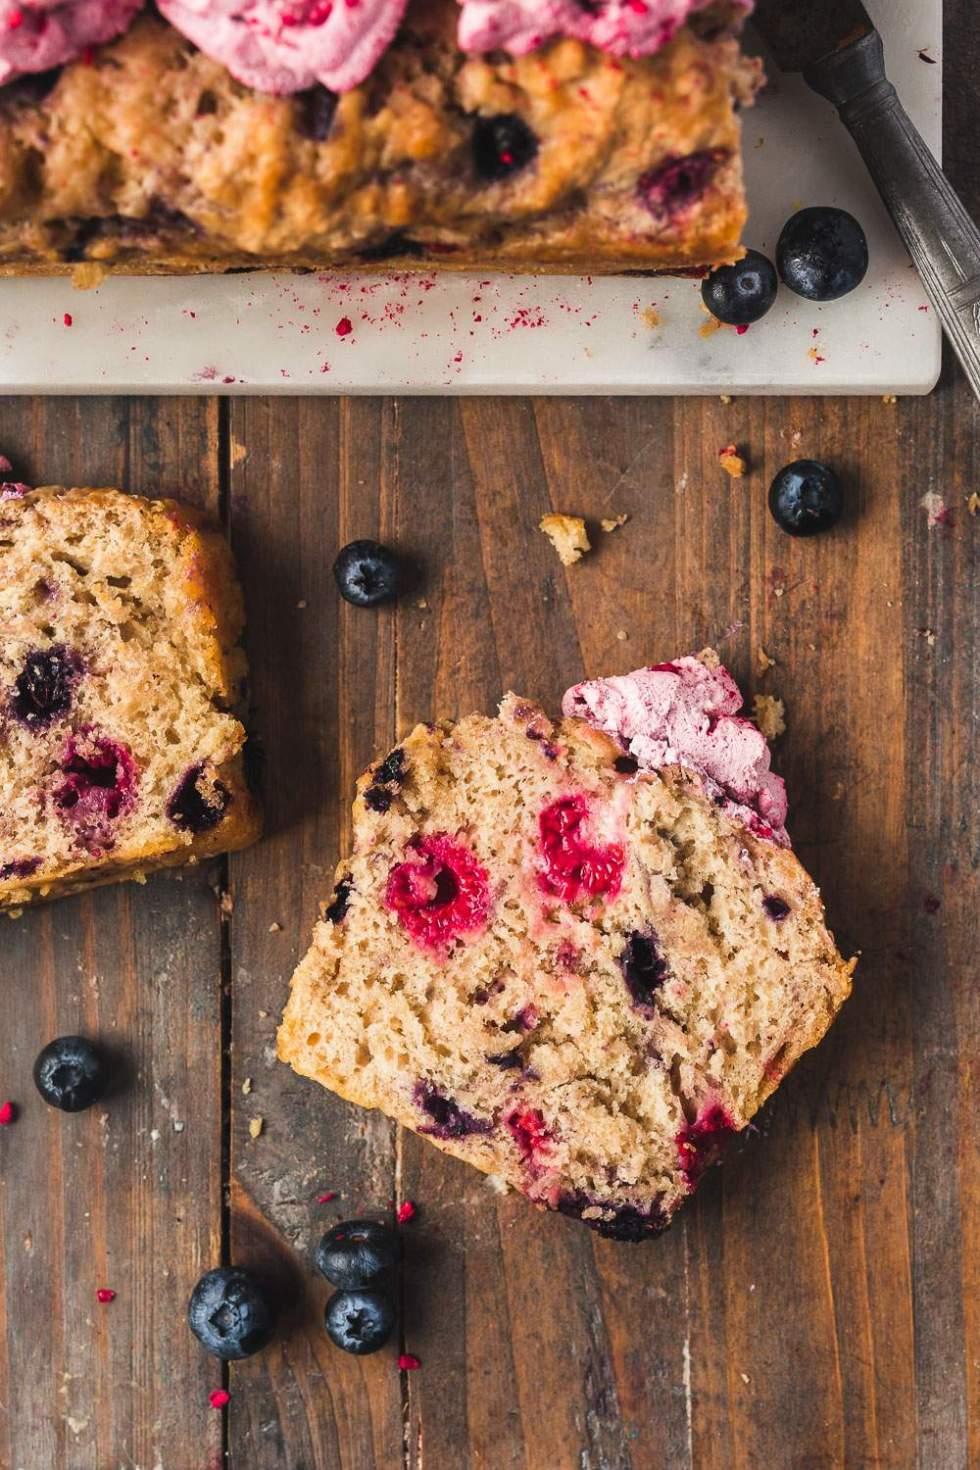 Vegan cider bread with blueberries